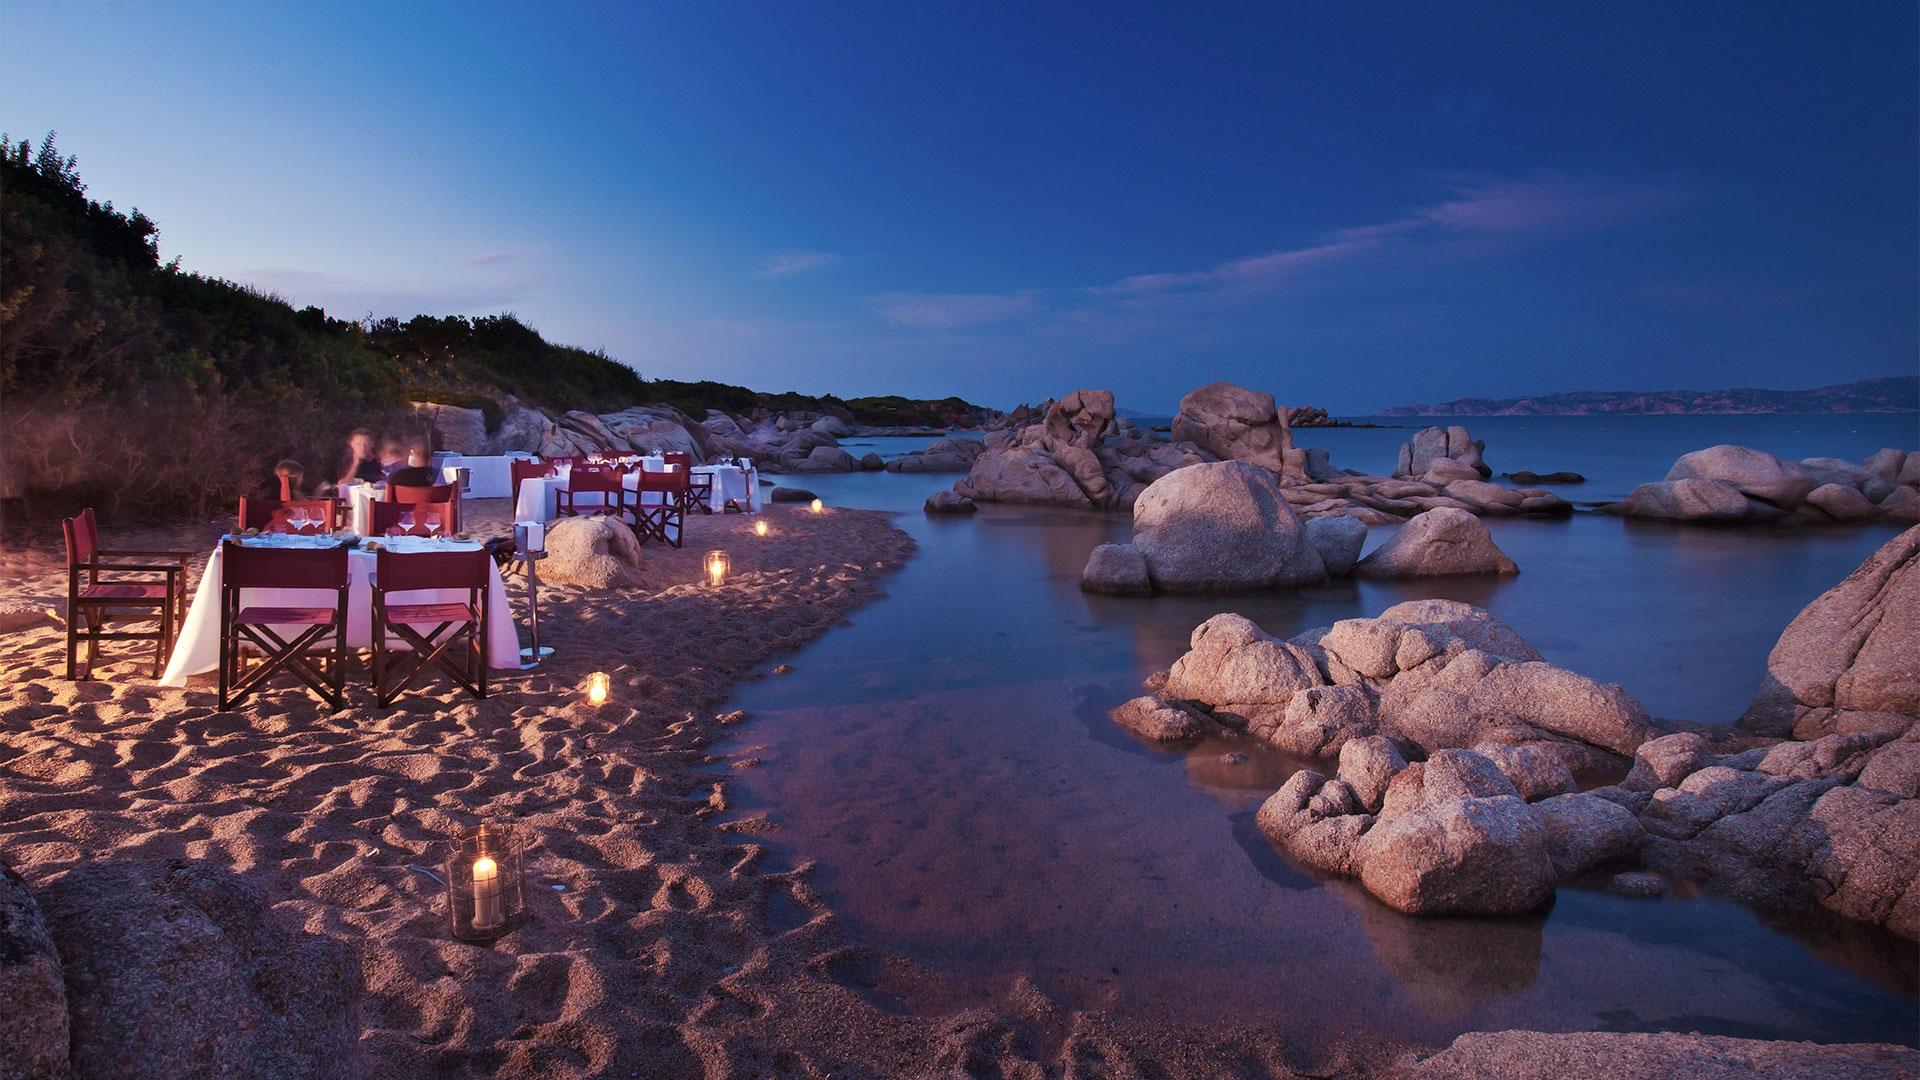 resort-valle-erica-slider-ristoranti-li-zini-sardegna-1